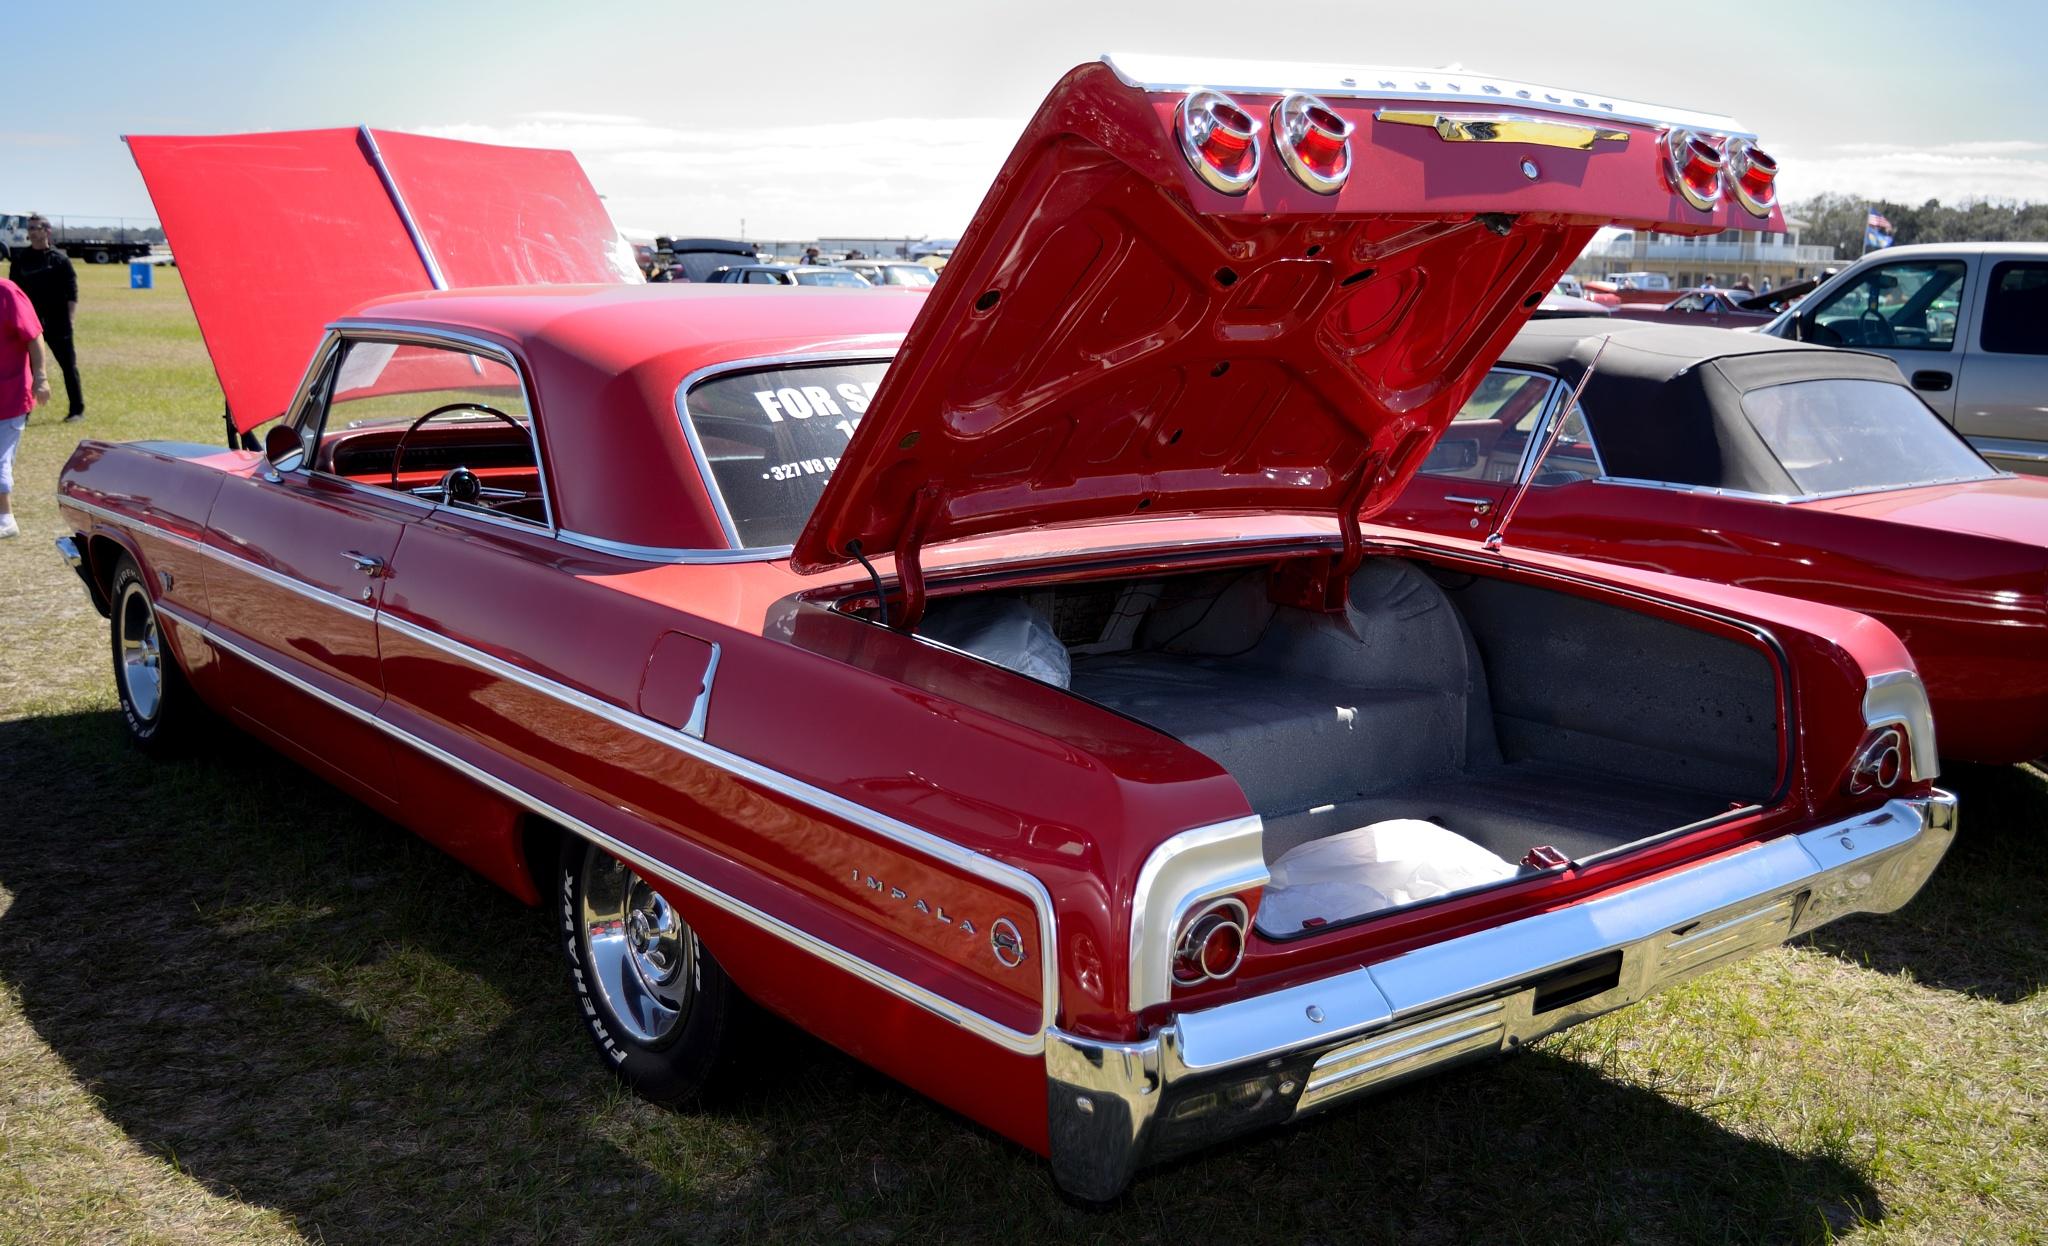 Classic Impala by Joe Bike